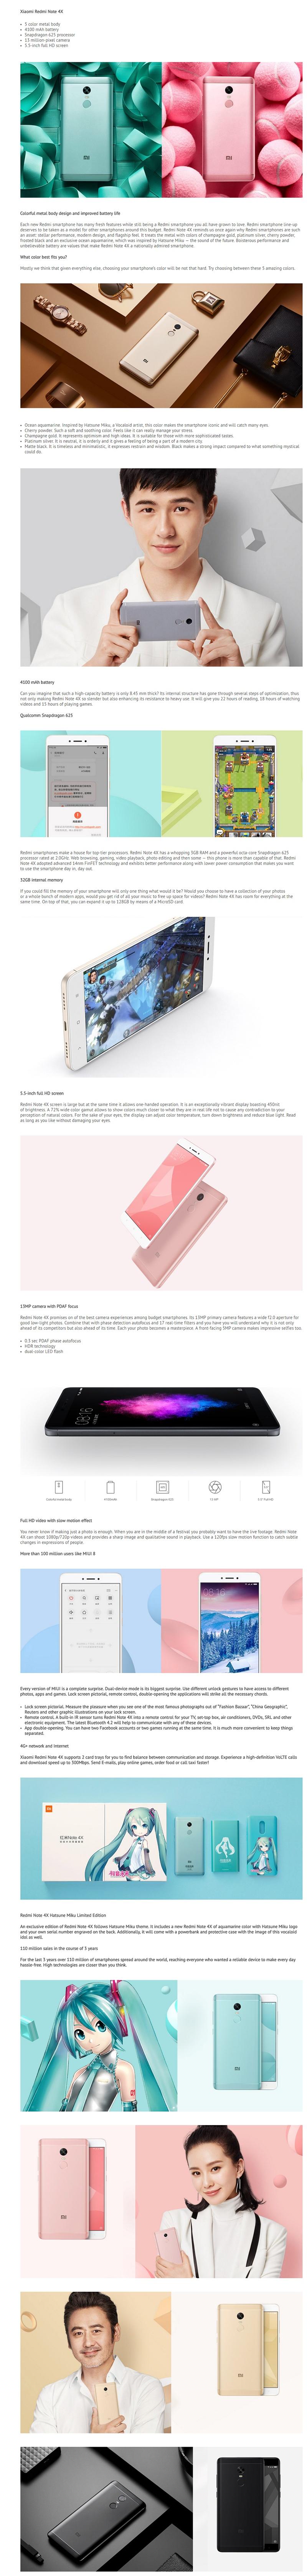 Xiaomi Redmi Note 4x 3gb Ram 32gb International Rom Lazada Singapore Specifications Of